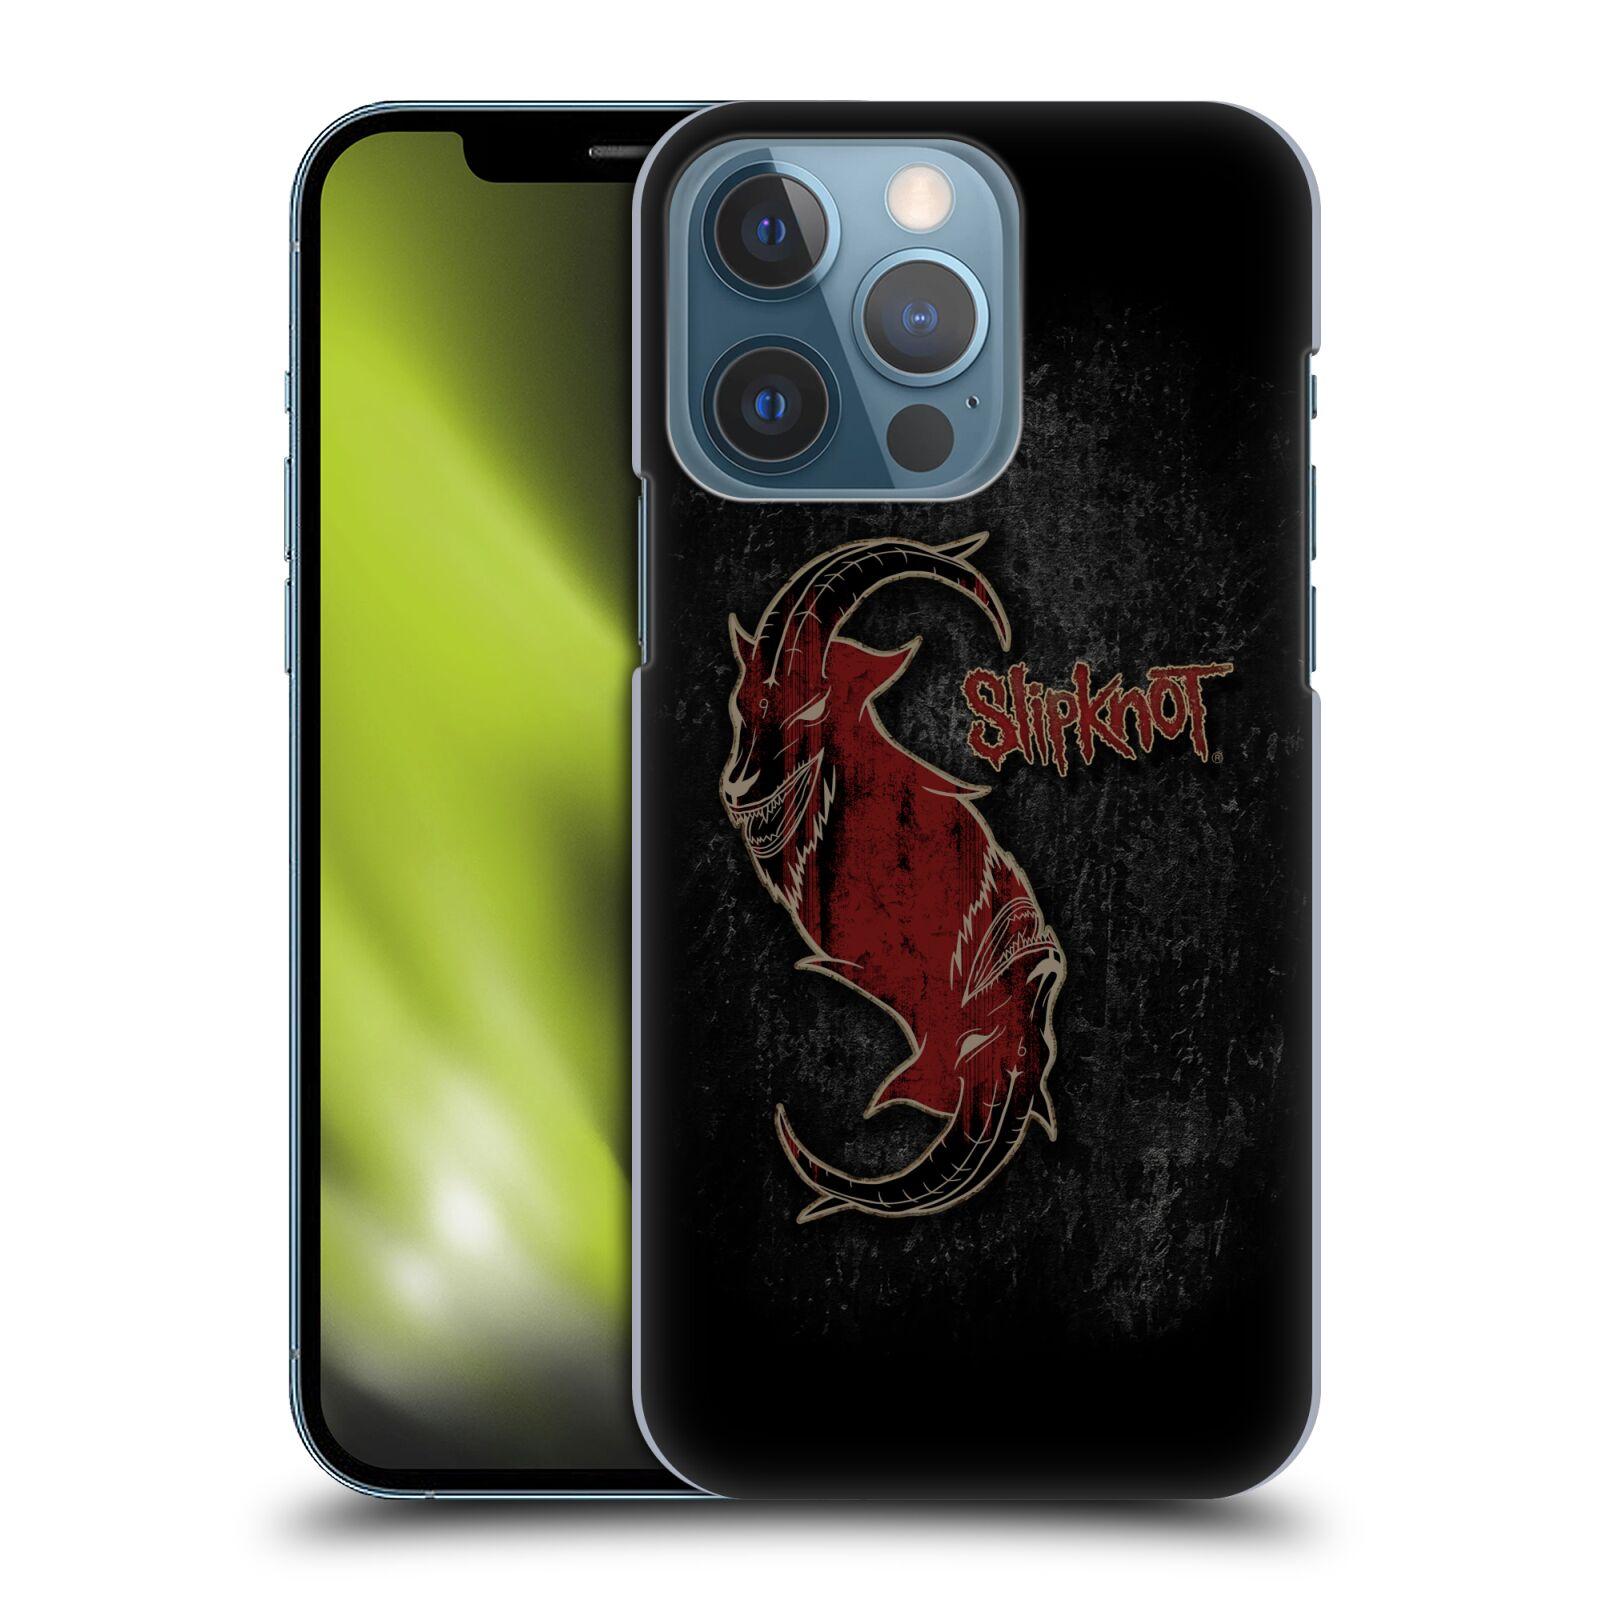 Plastové pouzdro na mobil Apple iPhone 13 Pro - Head Case - Slipknot - Rudý kozel